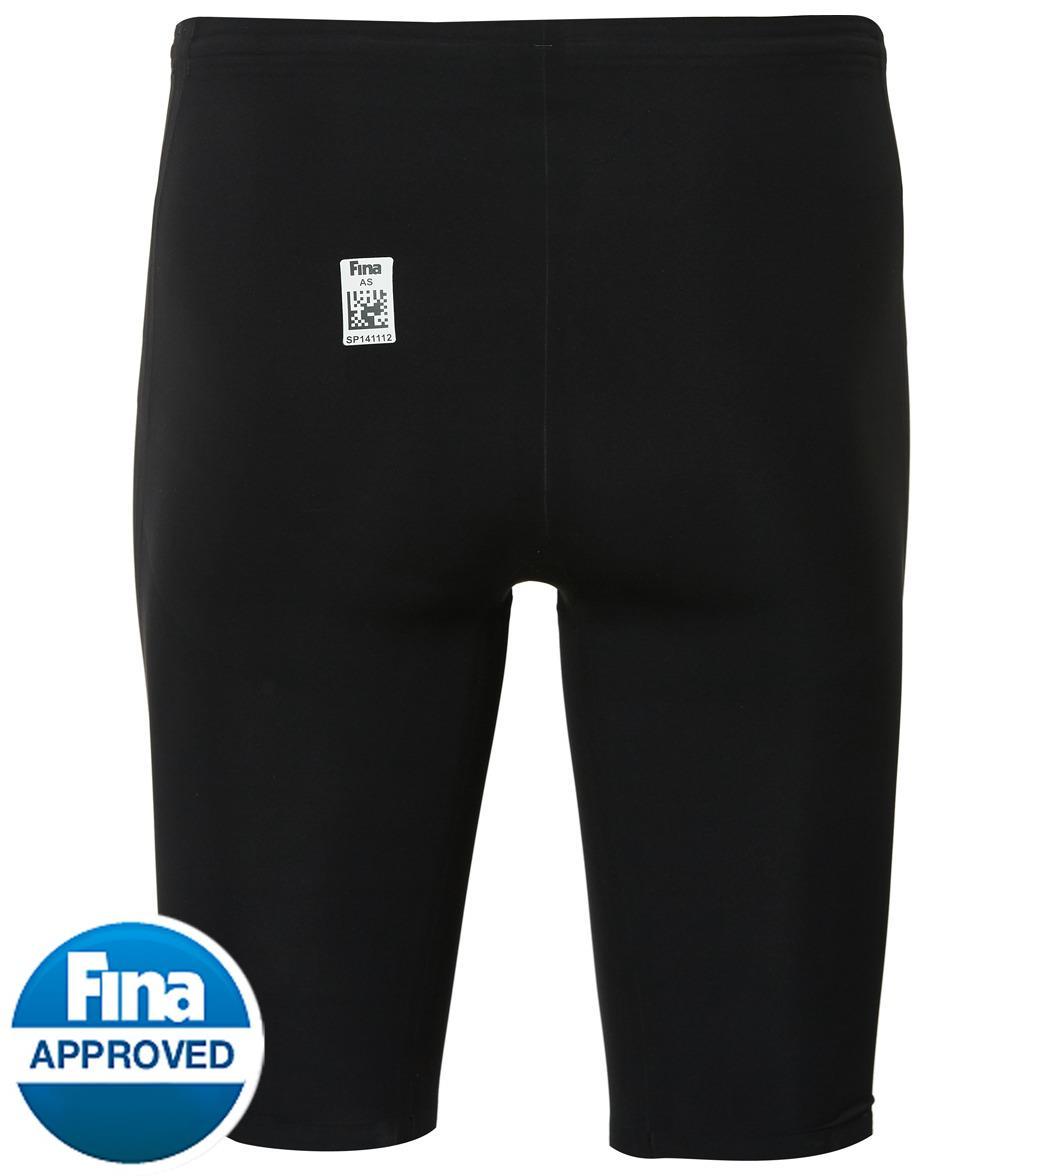 37cd64fa95359 Speedo Men's LZR Pure Valor High Waist Jammer Tech Suit Swimsuit at ...